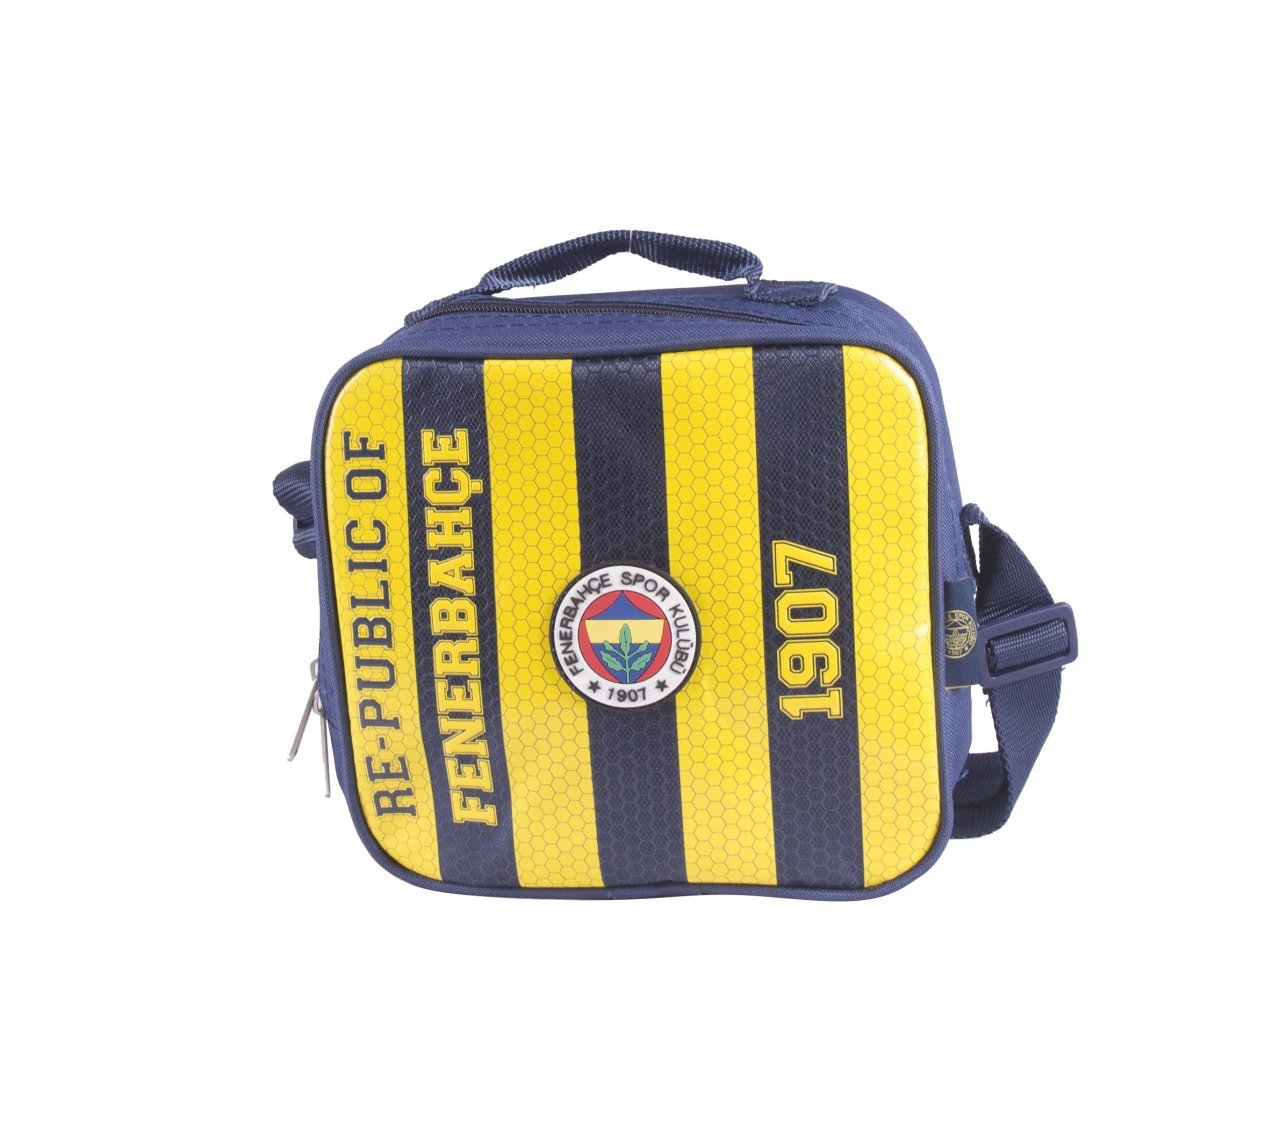 55b5b47a0e7bd Fenerbahçe 87050 Beslenme Çantası - Hemen Alın - OfisMalzemesi.com